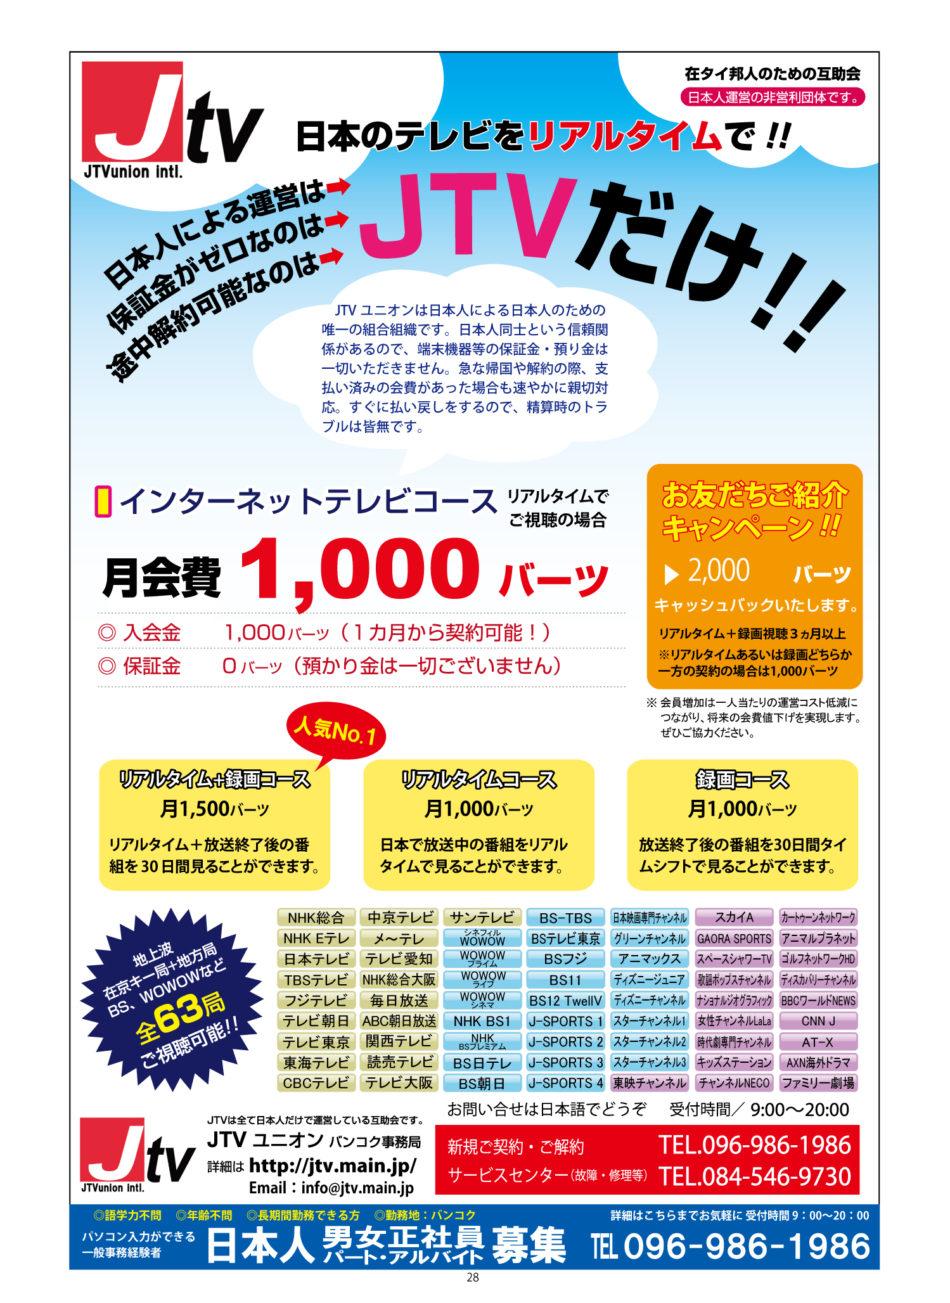 JHOMETVの広告